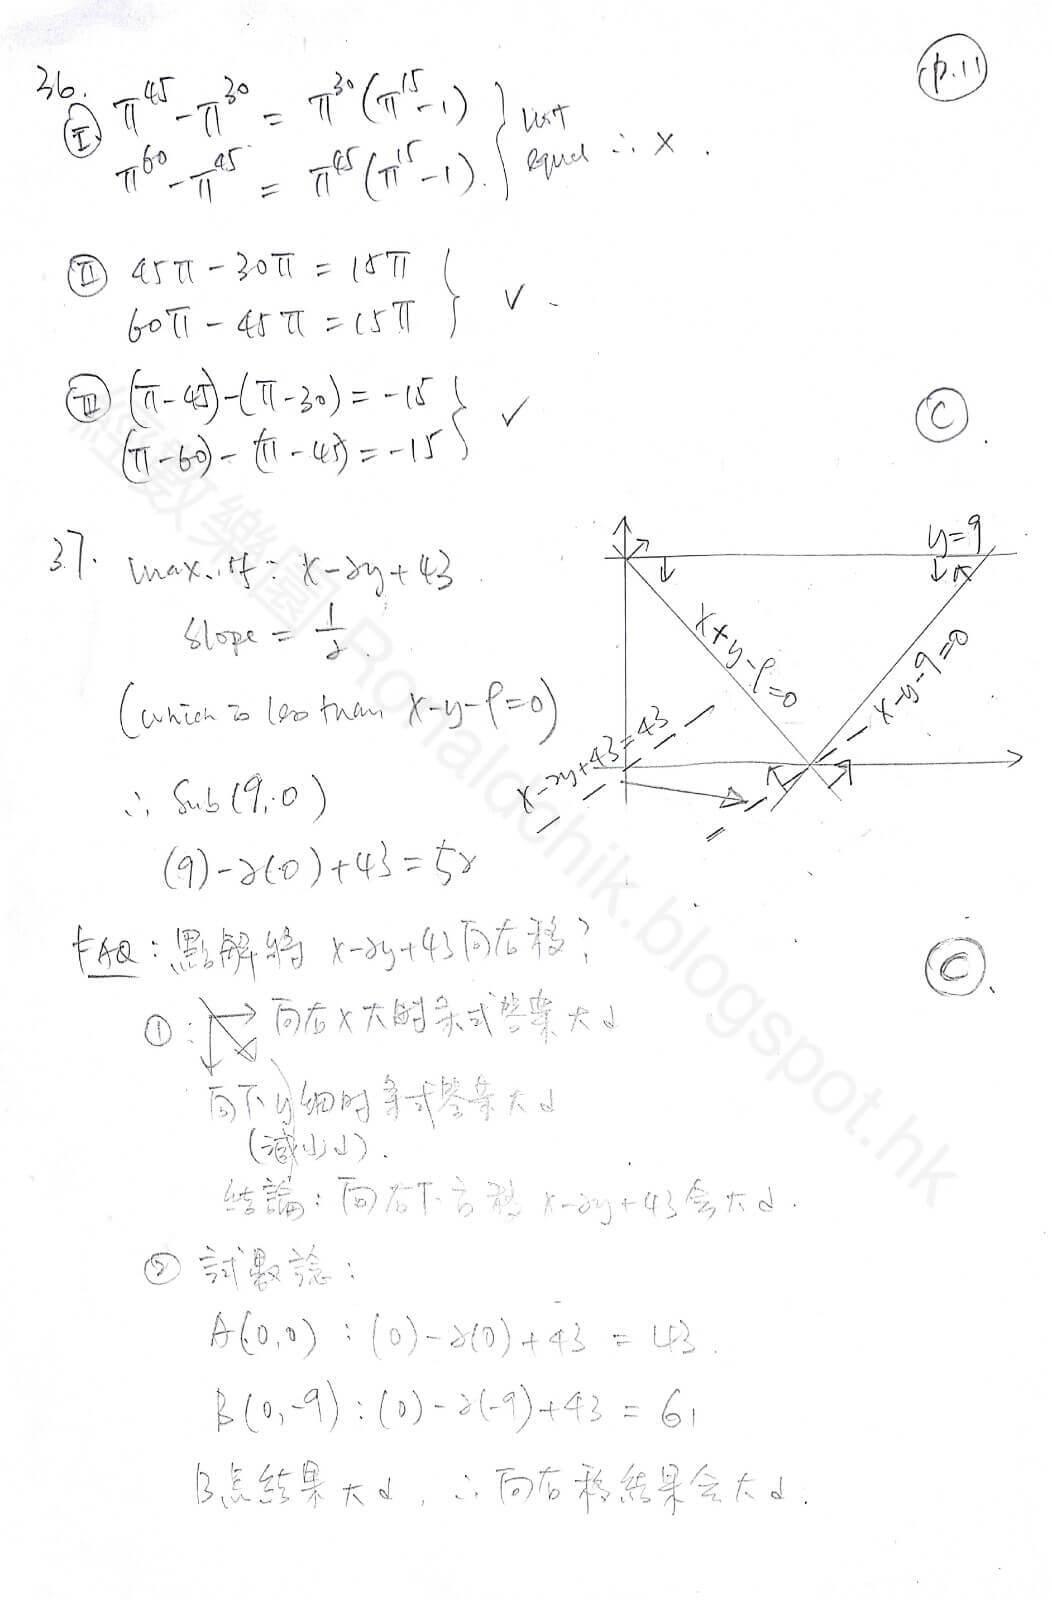 2017 DSE Math 卷二 Paper 2 MC 每條問題詳解 Part 2 (Q. 24-45) - 經數樂園-學習變有趣~ |||[補習(小組|私人)]